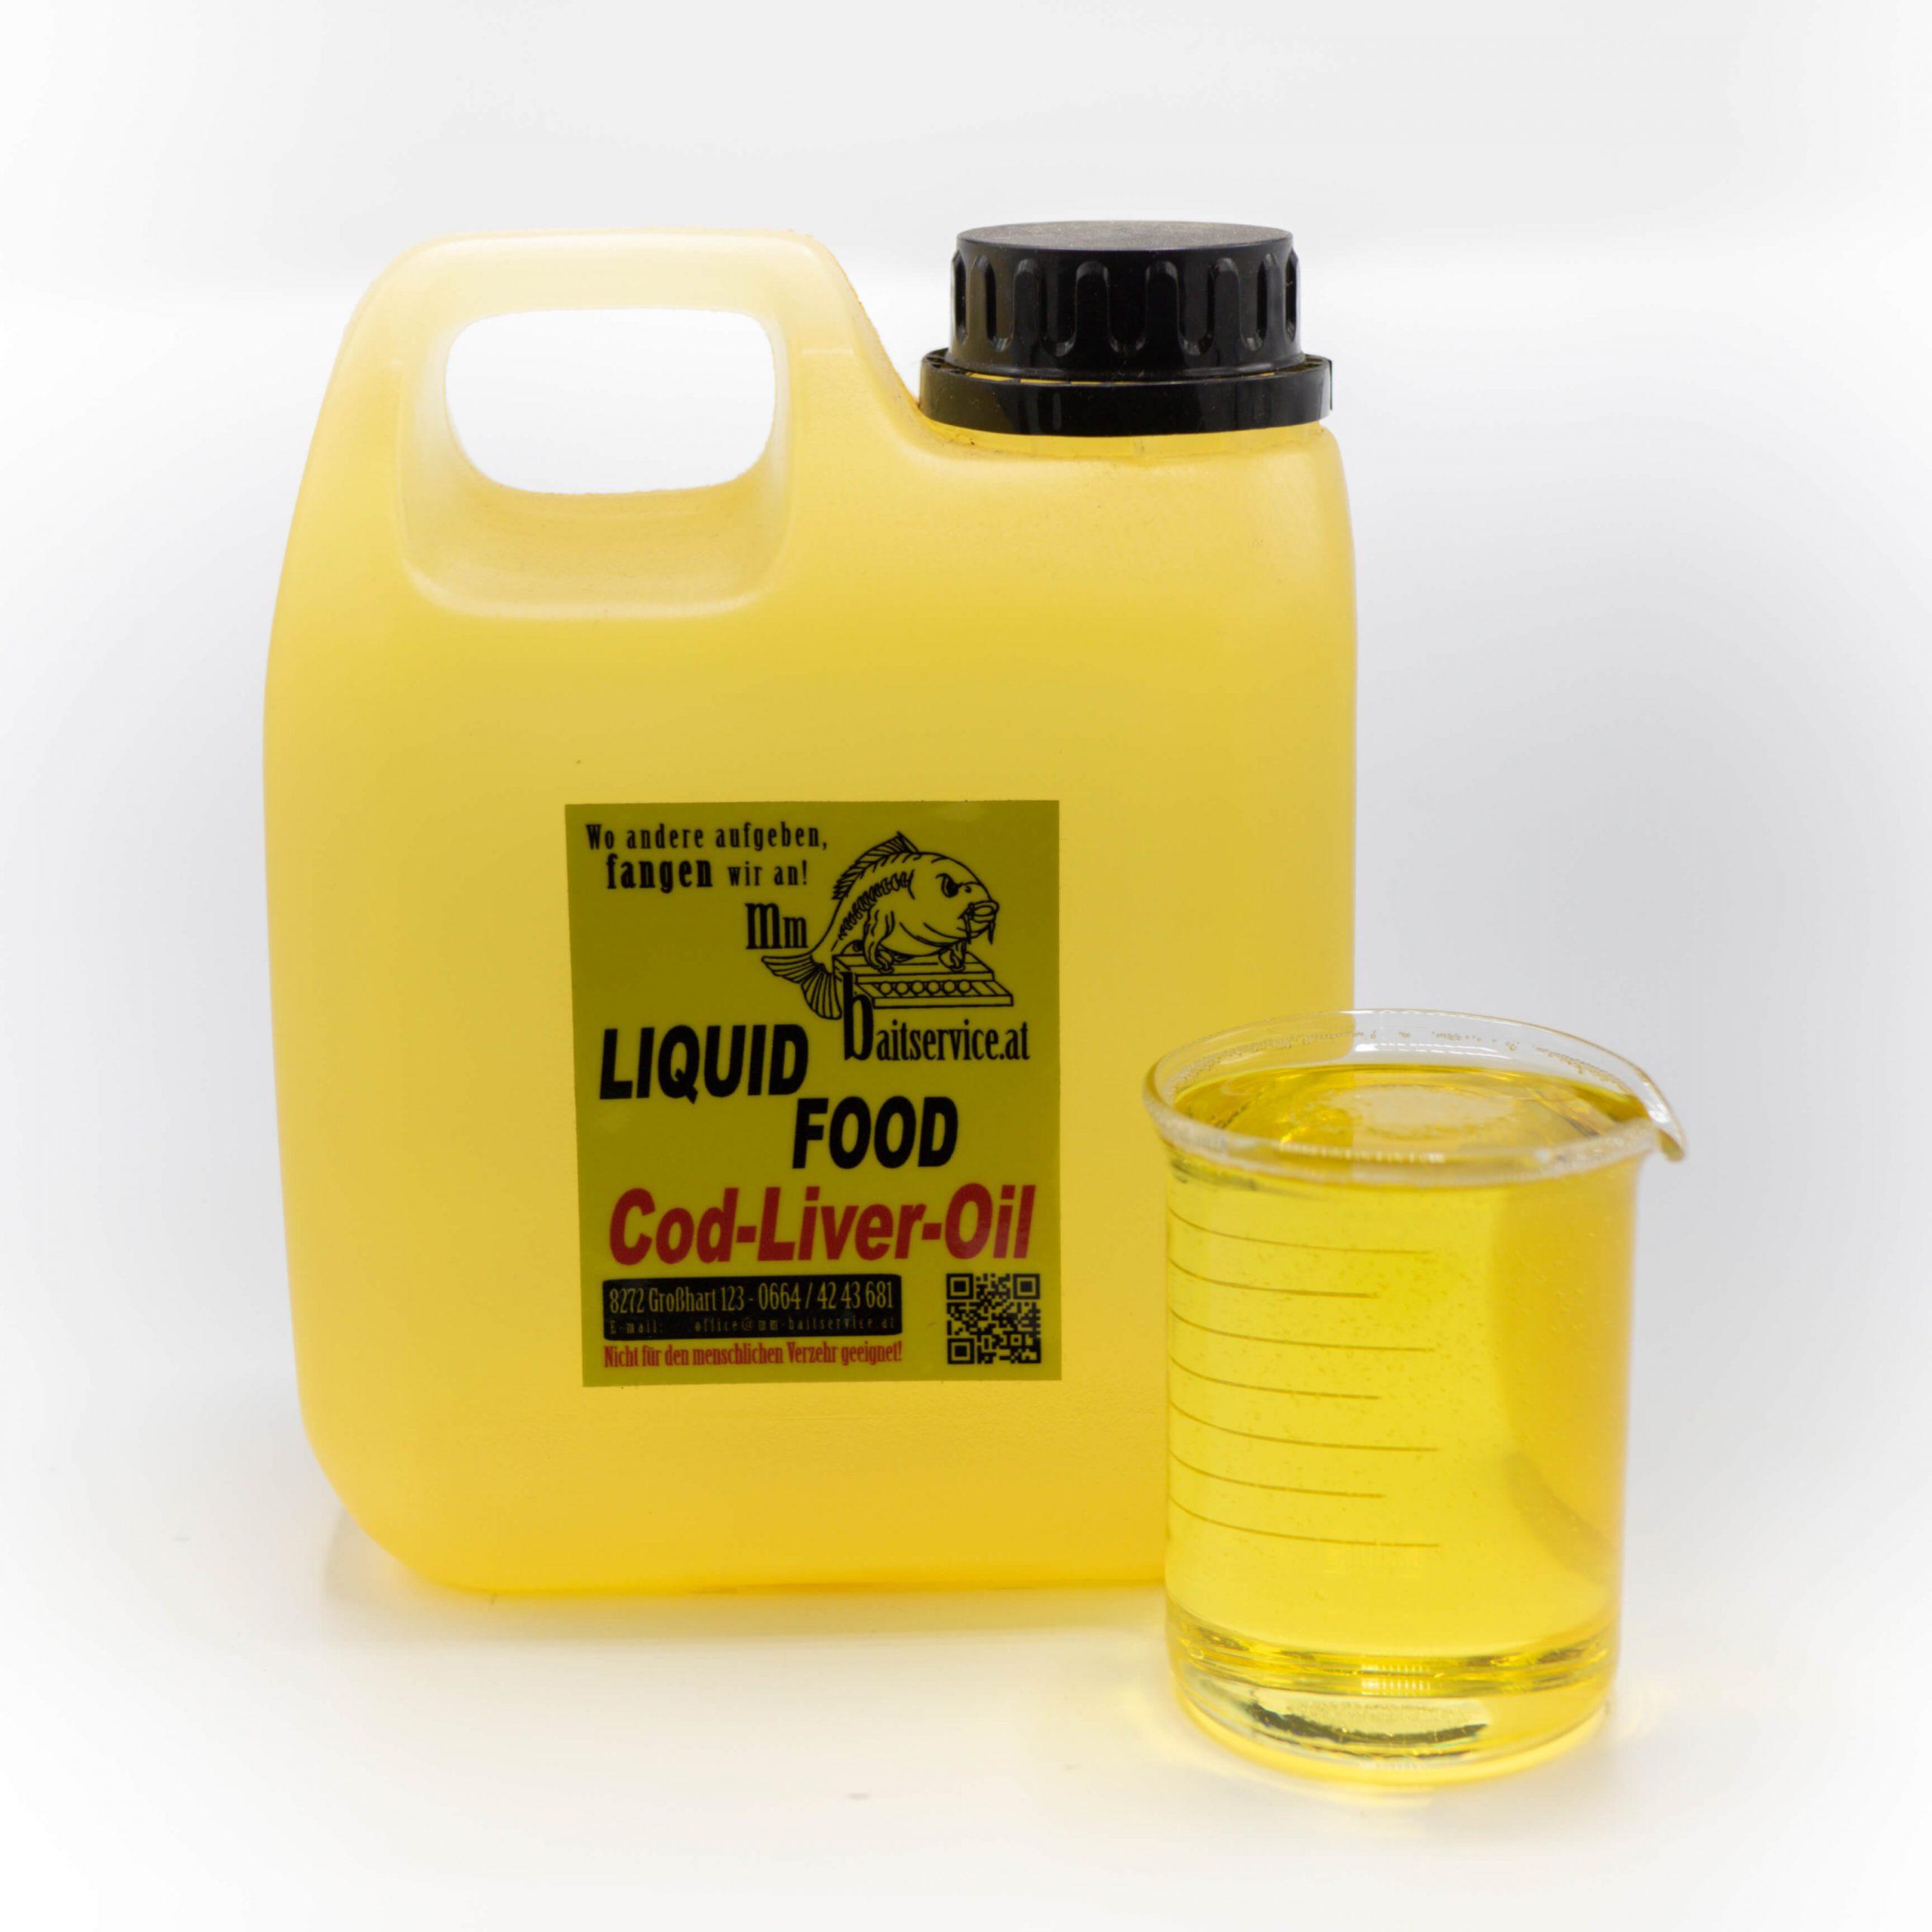 COD-Liver-Extract - Liquid